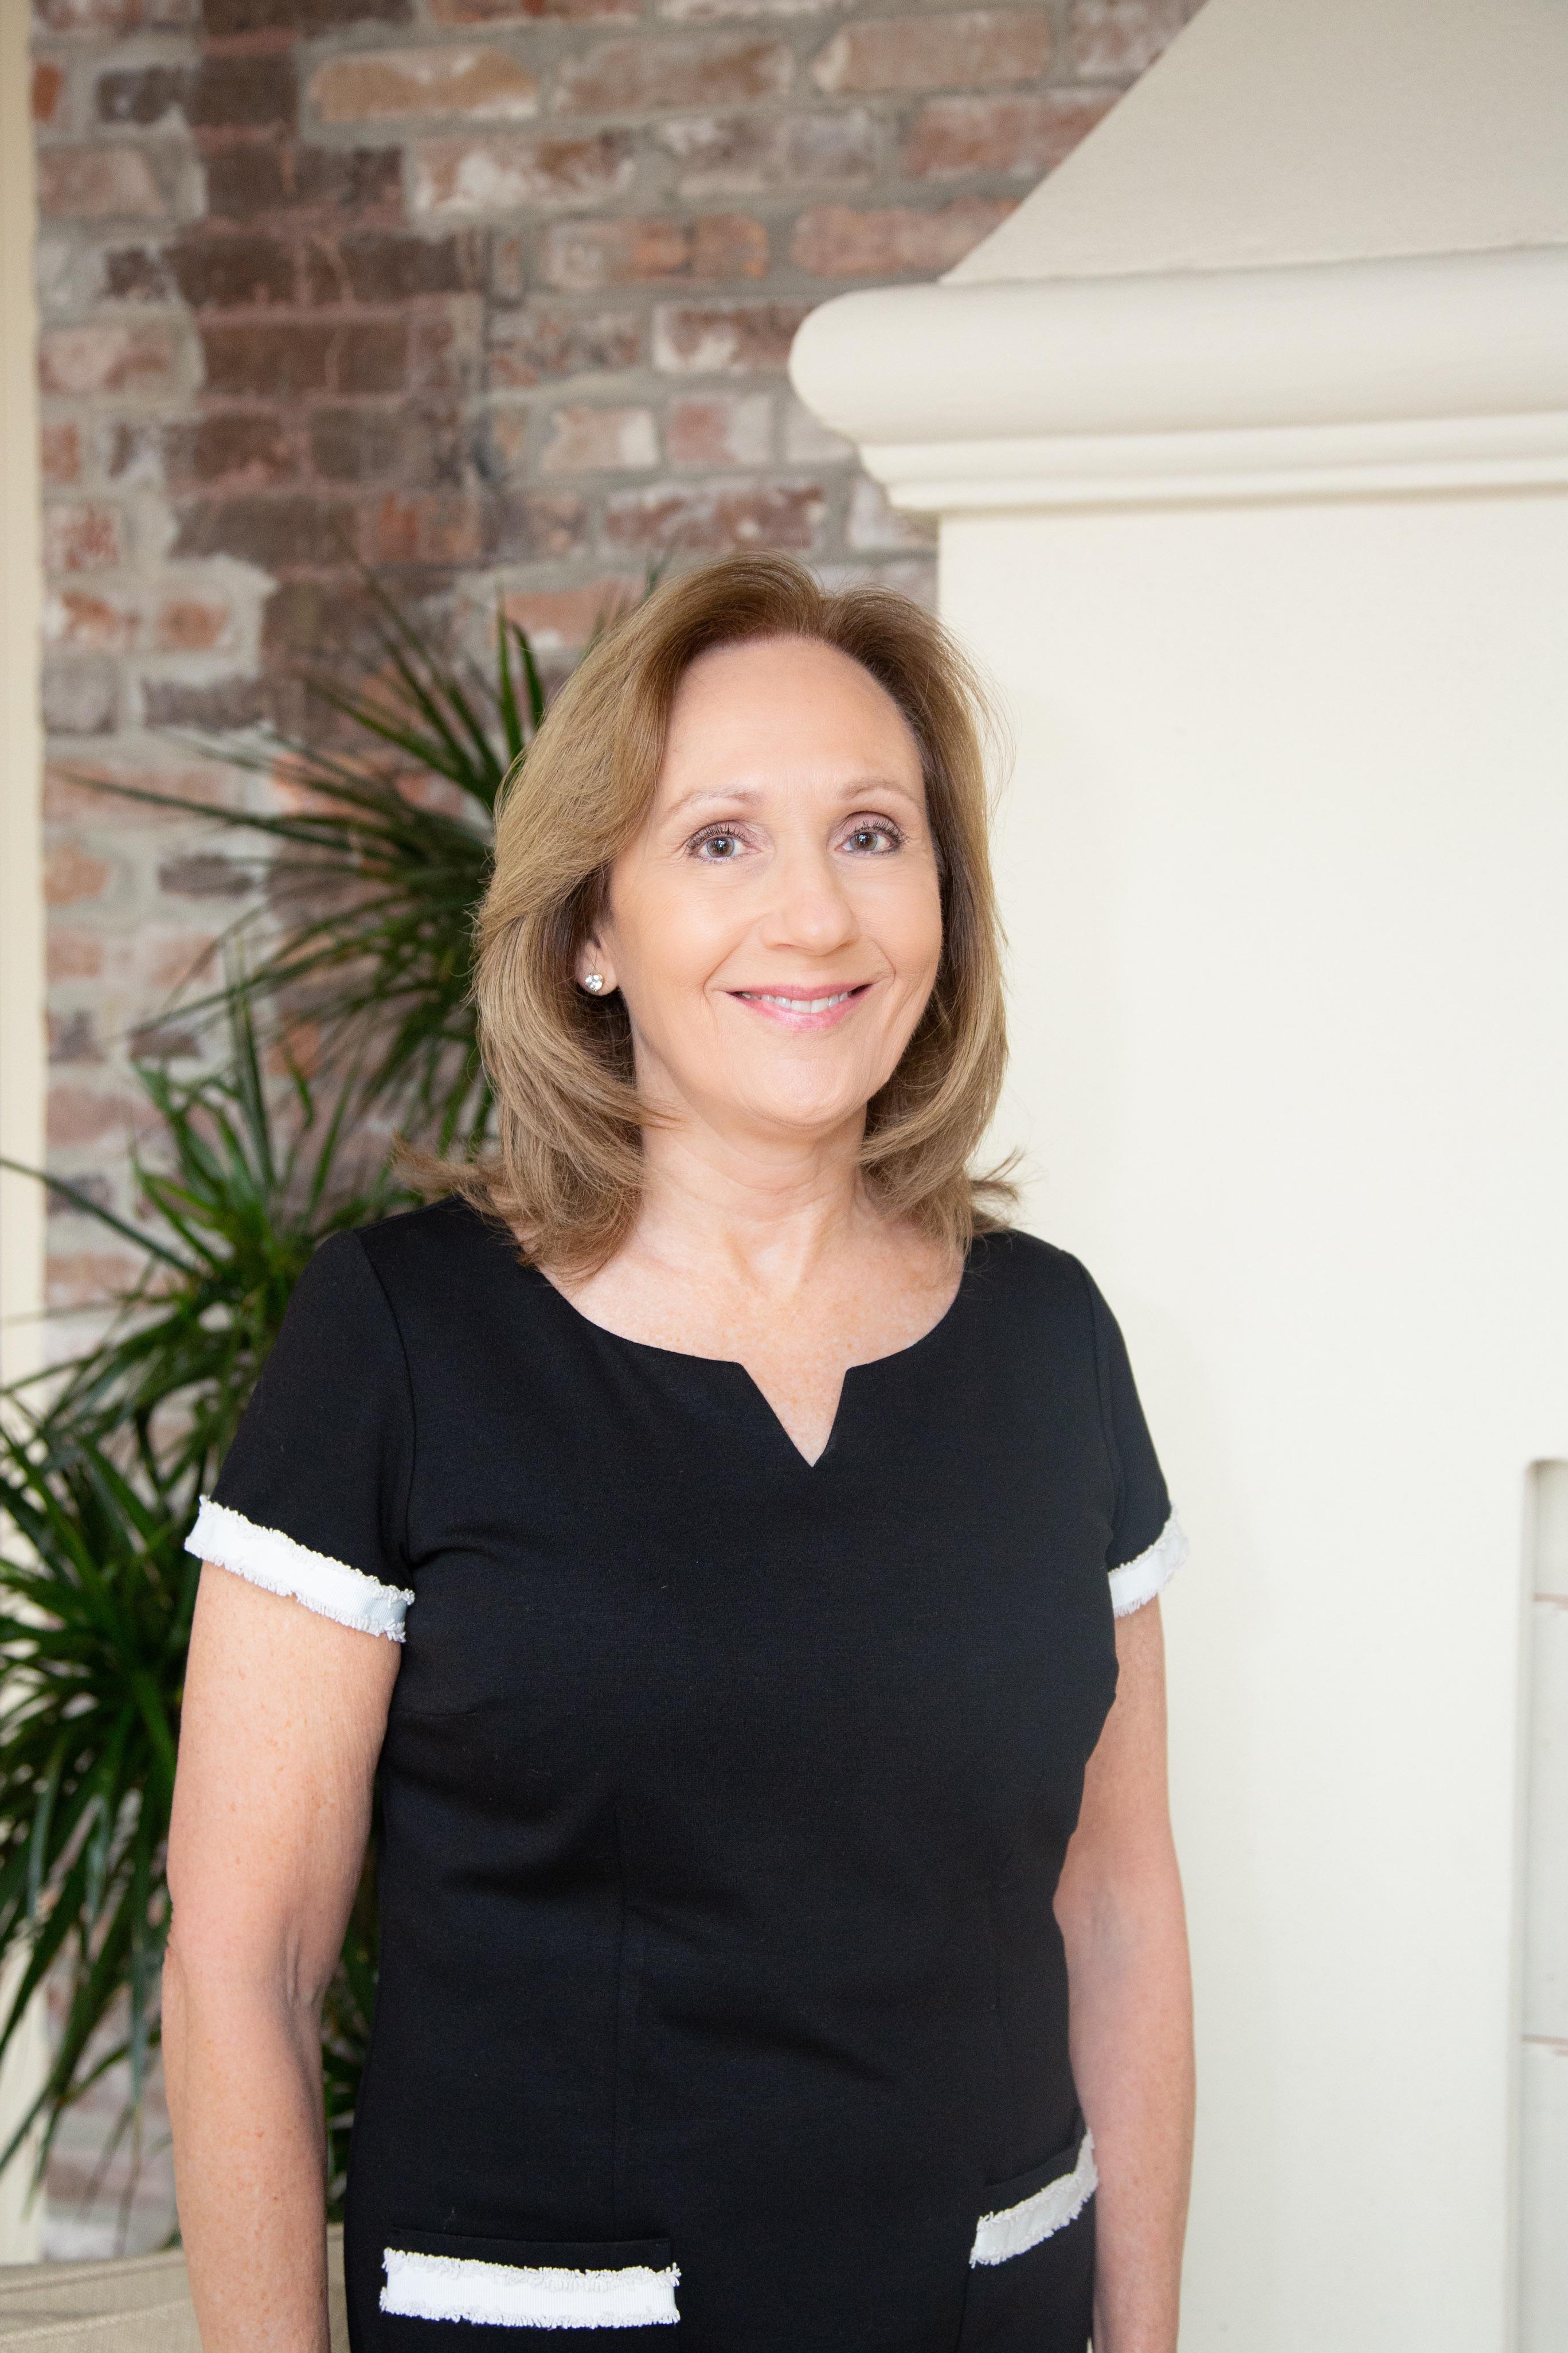 Janet Hickman